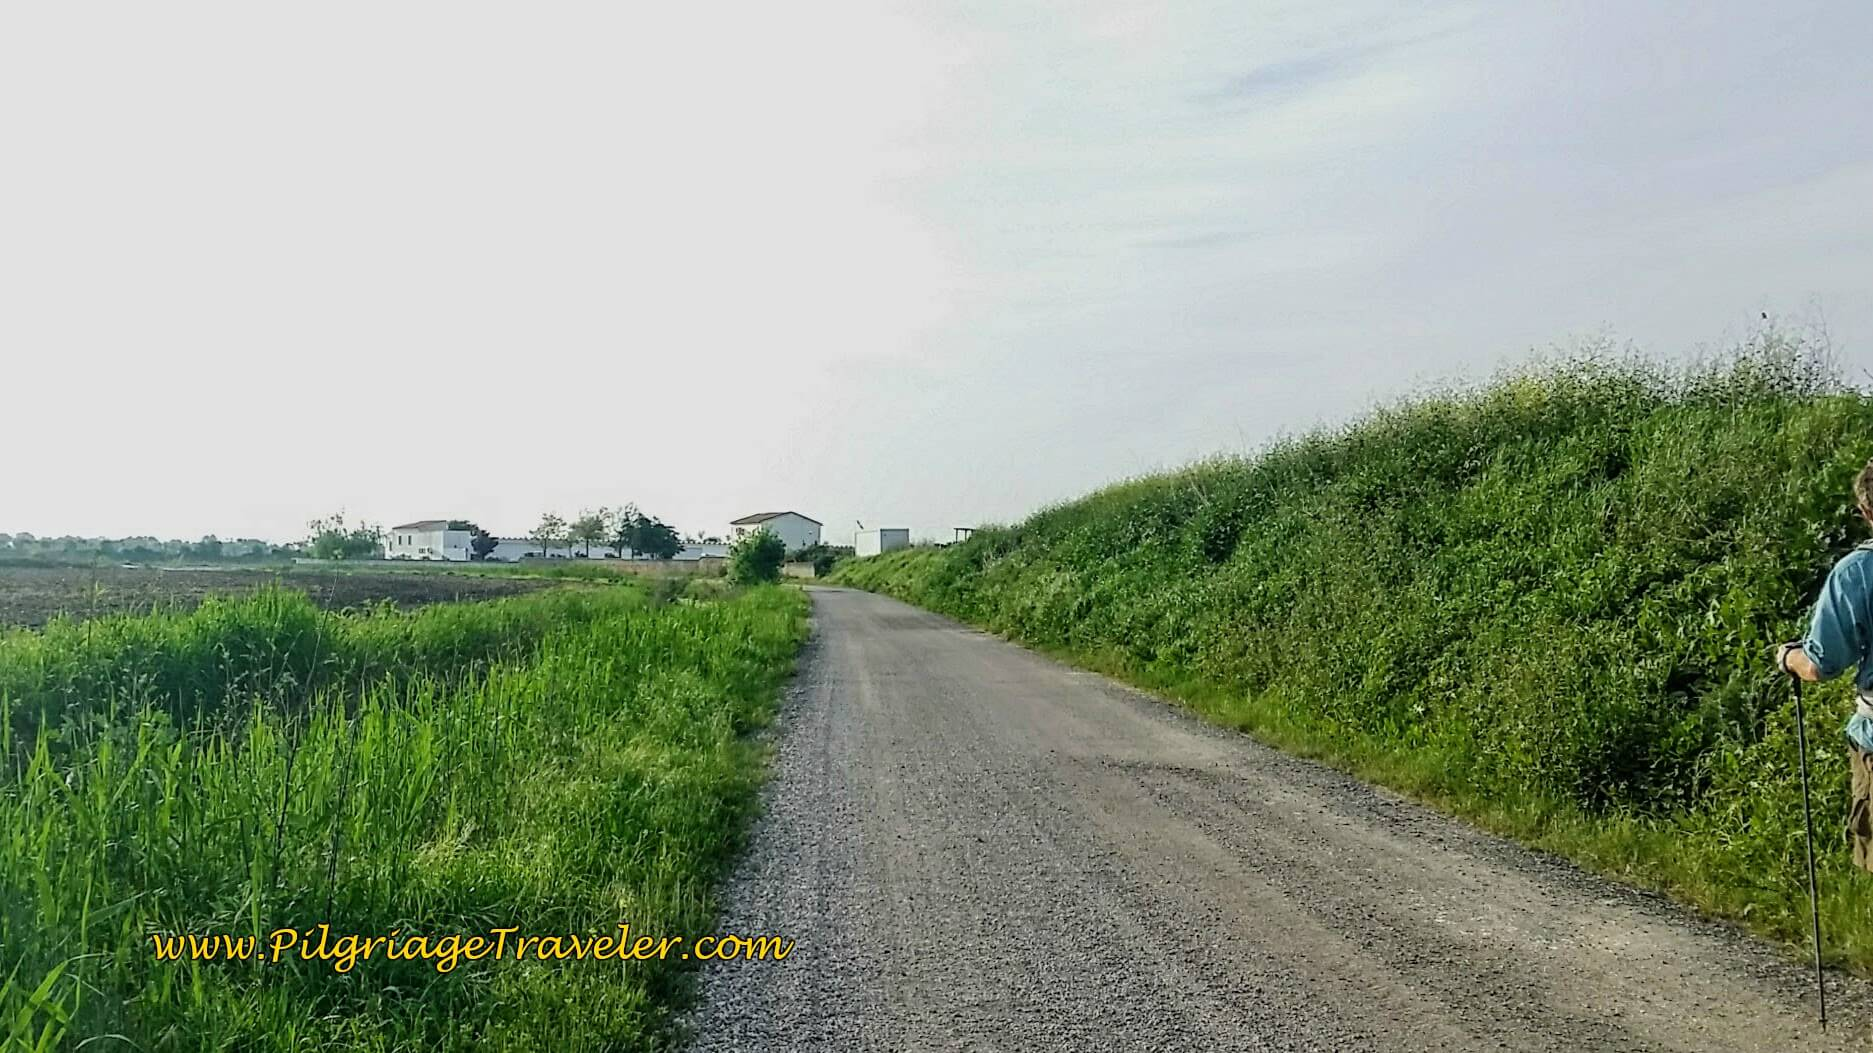 Walking Toward the Aeródromo de Alqueidâo and the N3-3